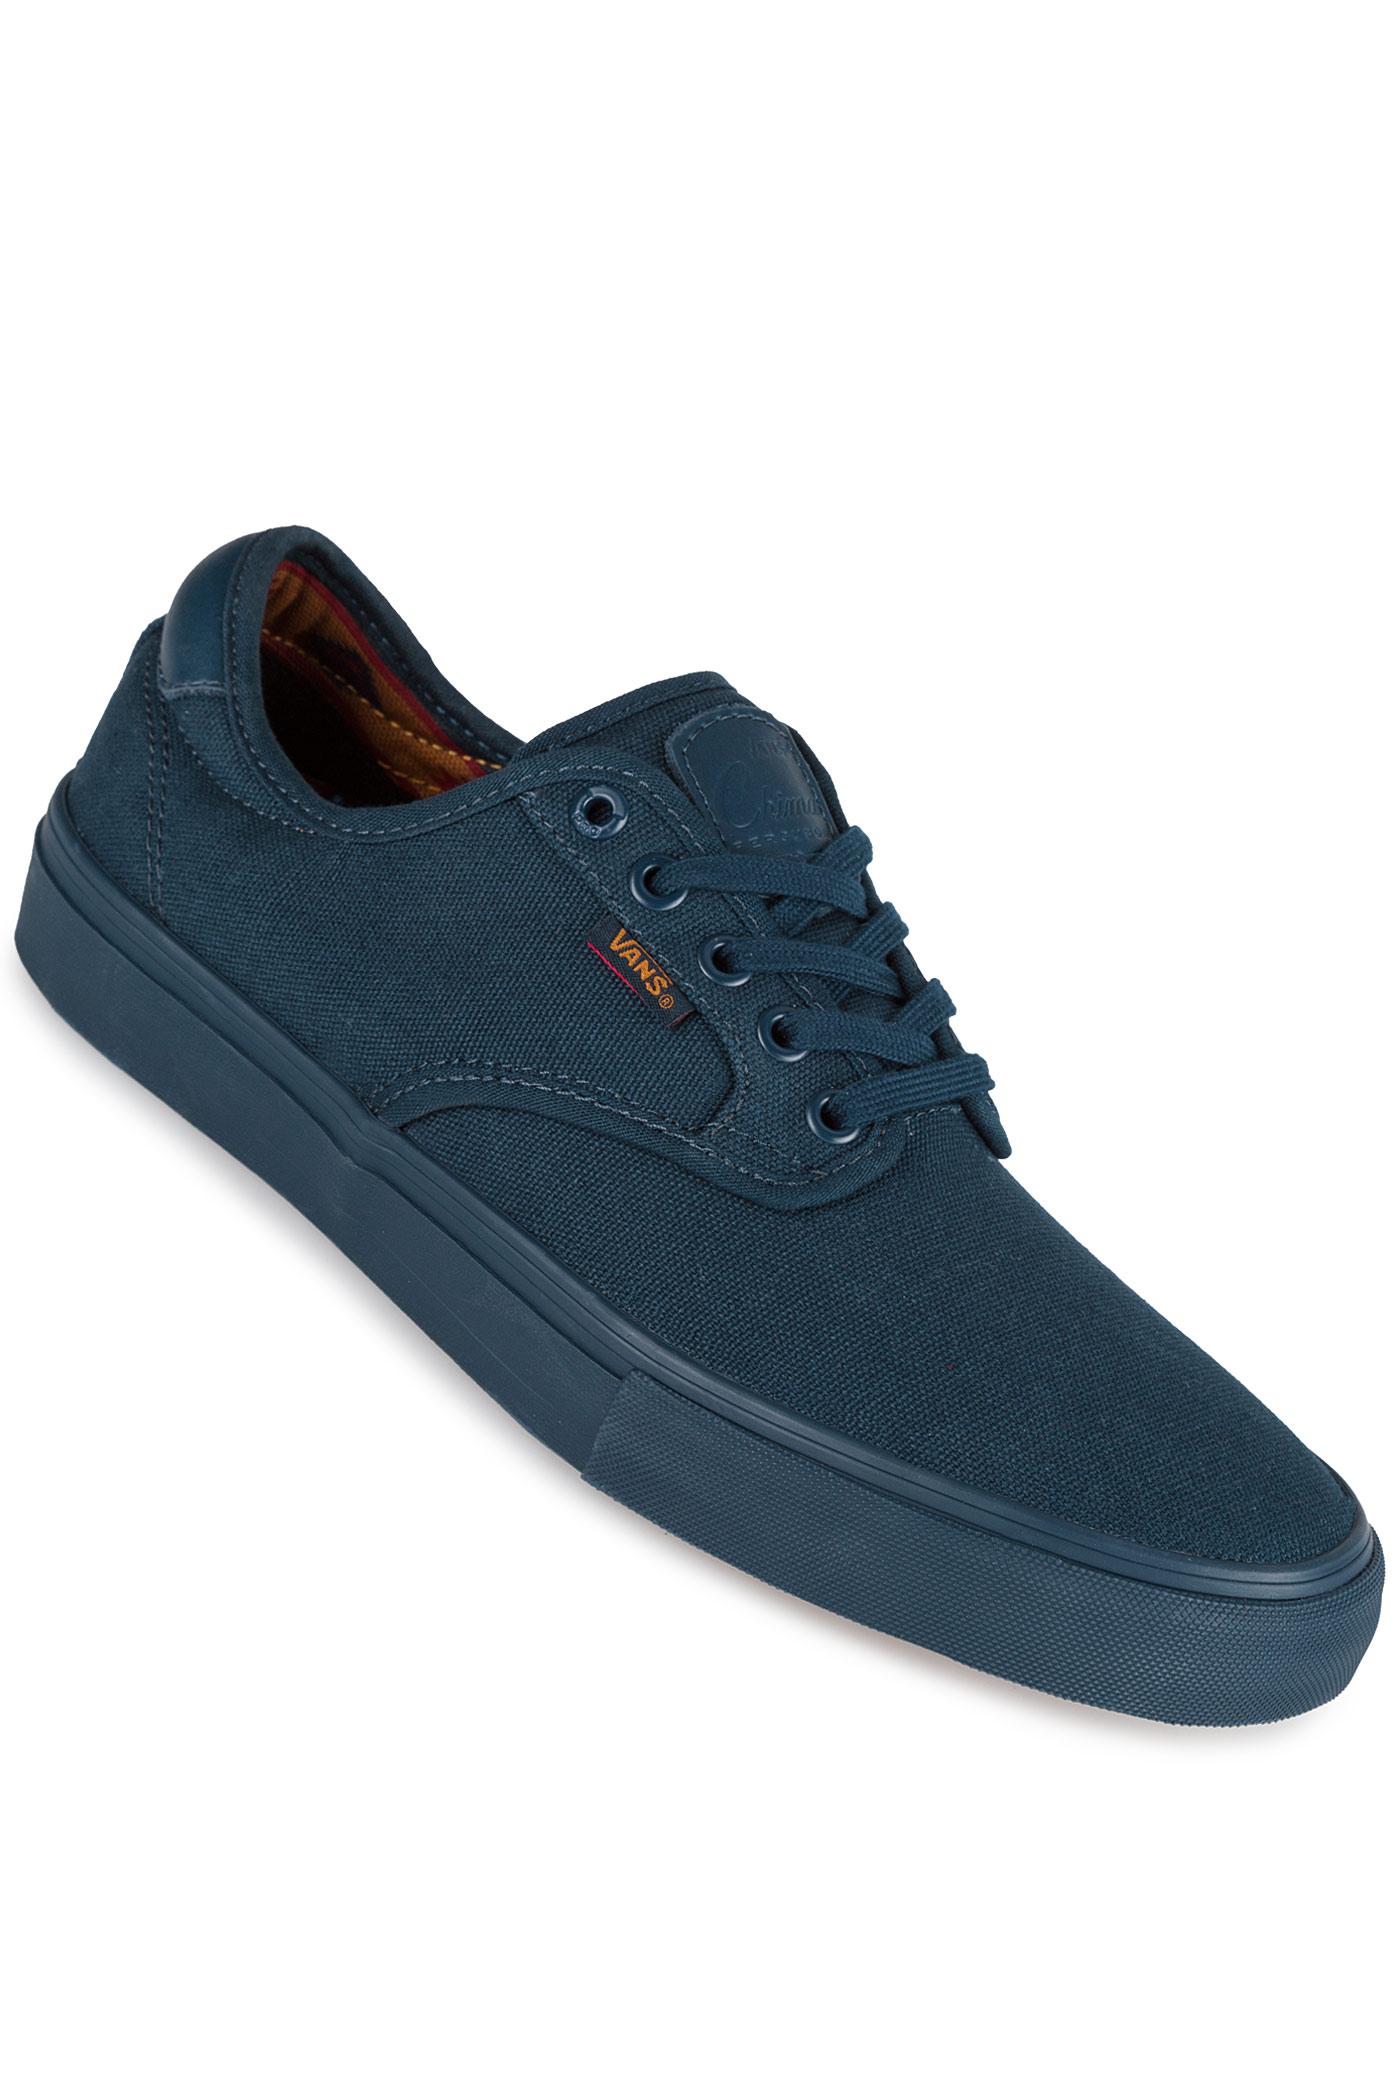 7089c6f070 Vans Chima Ferguson Pro Shoe (native dress blues mono) buy at ...